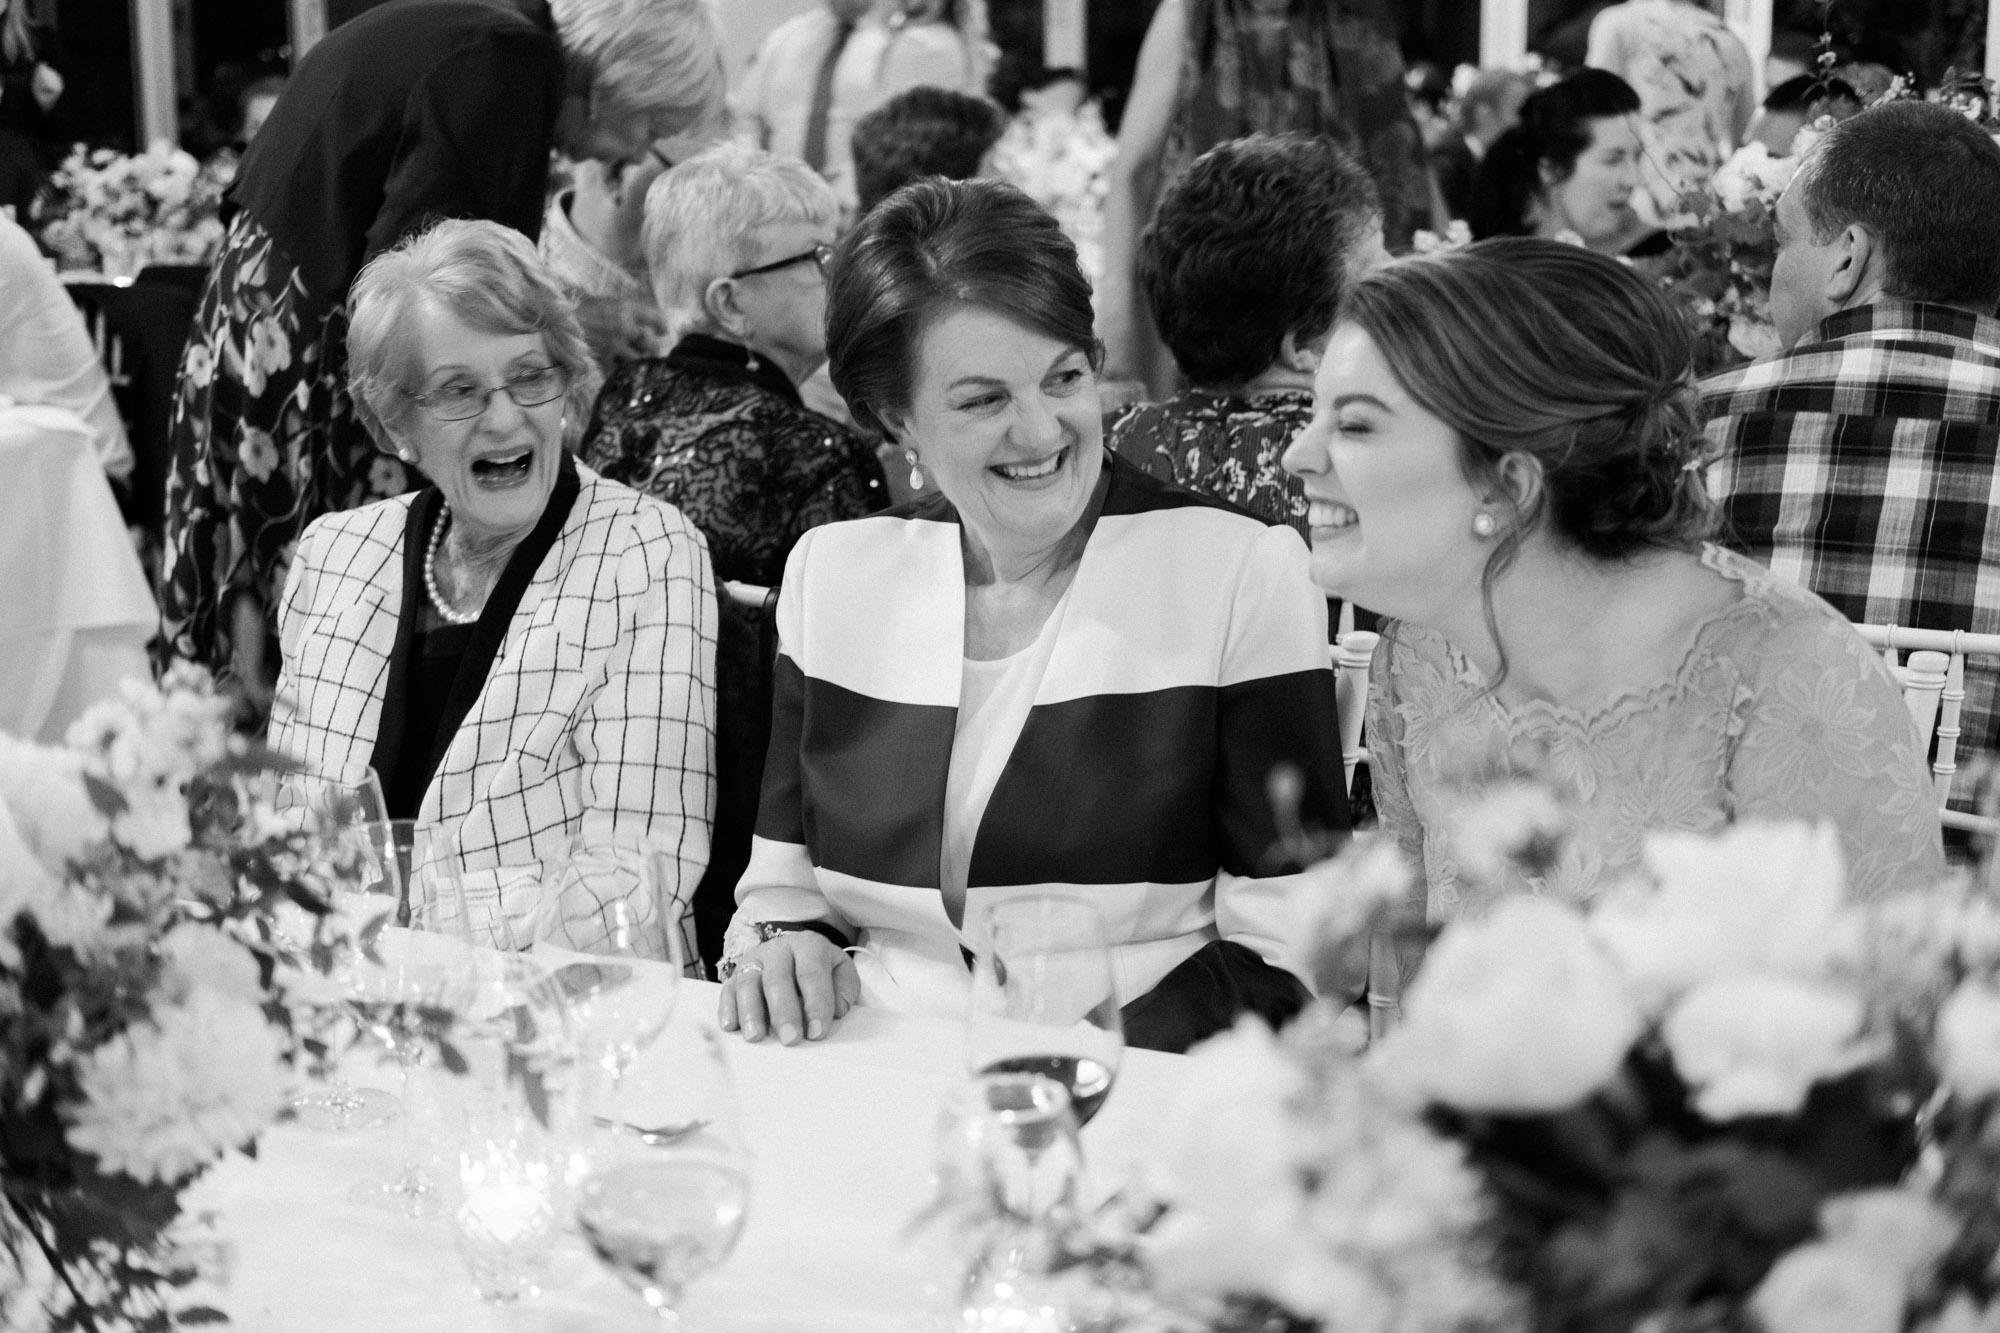 Glen-Ewin-Estate-wedding-photography-080.jpg